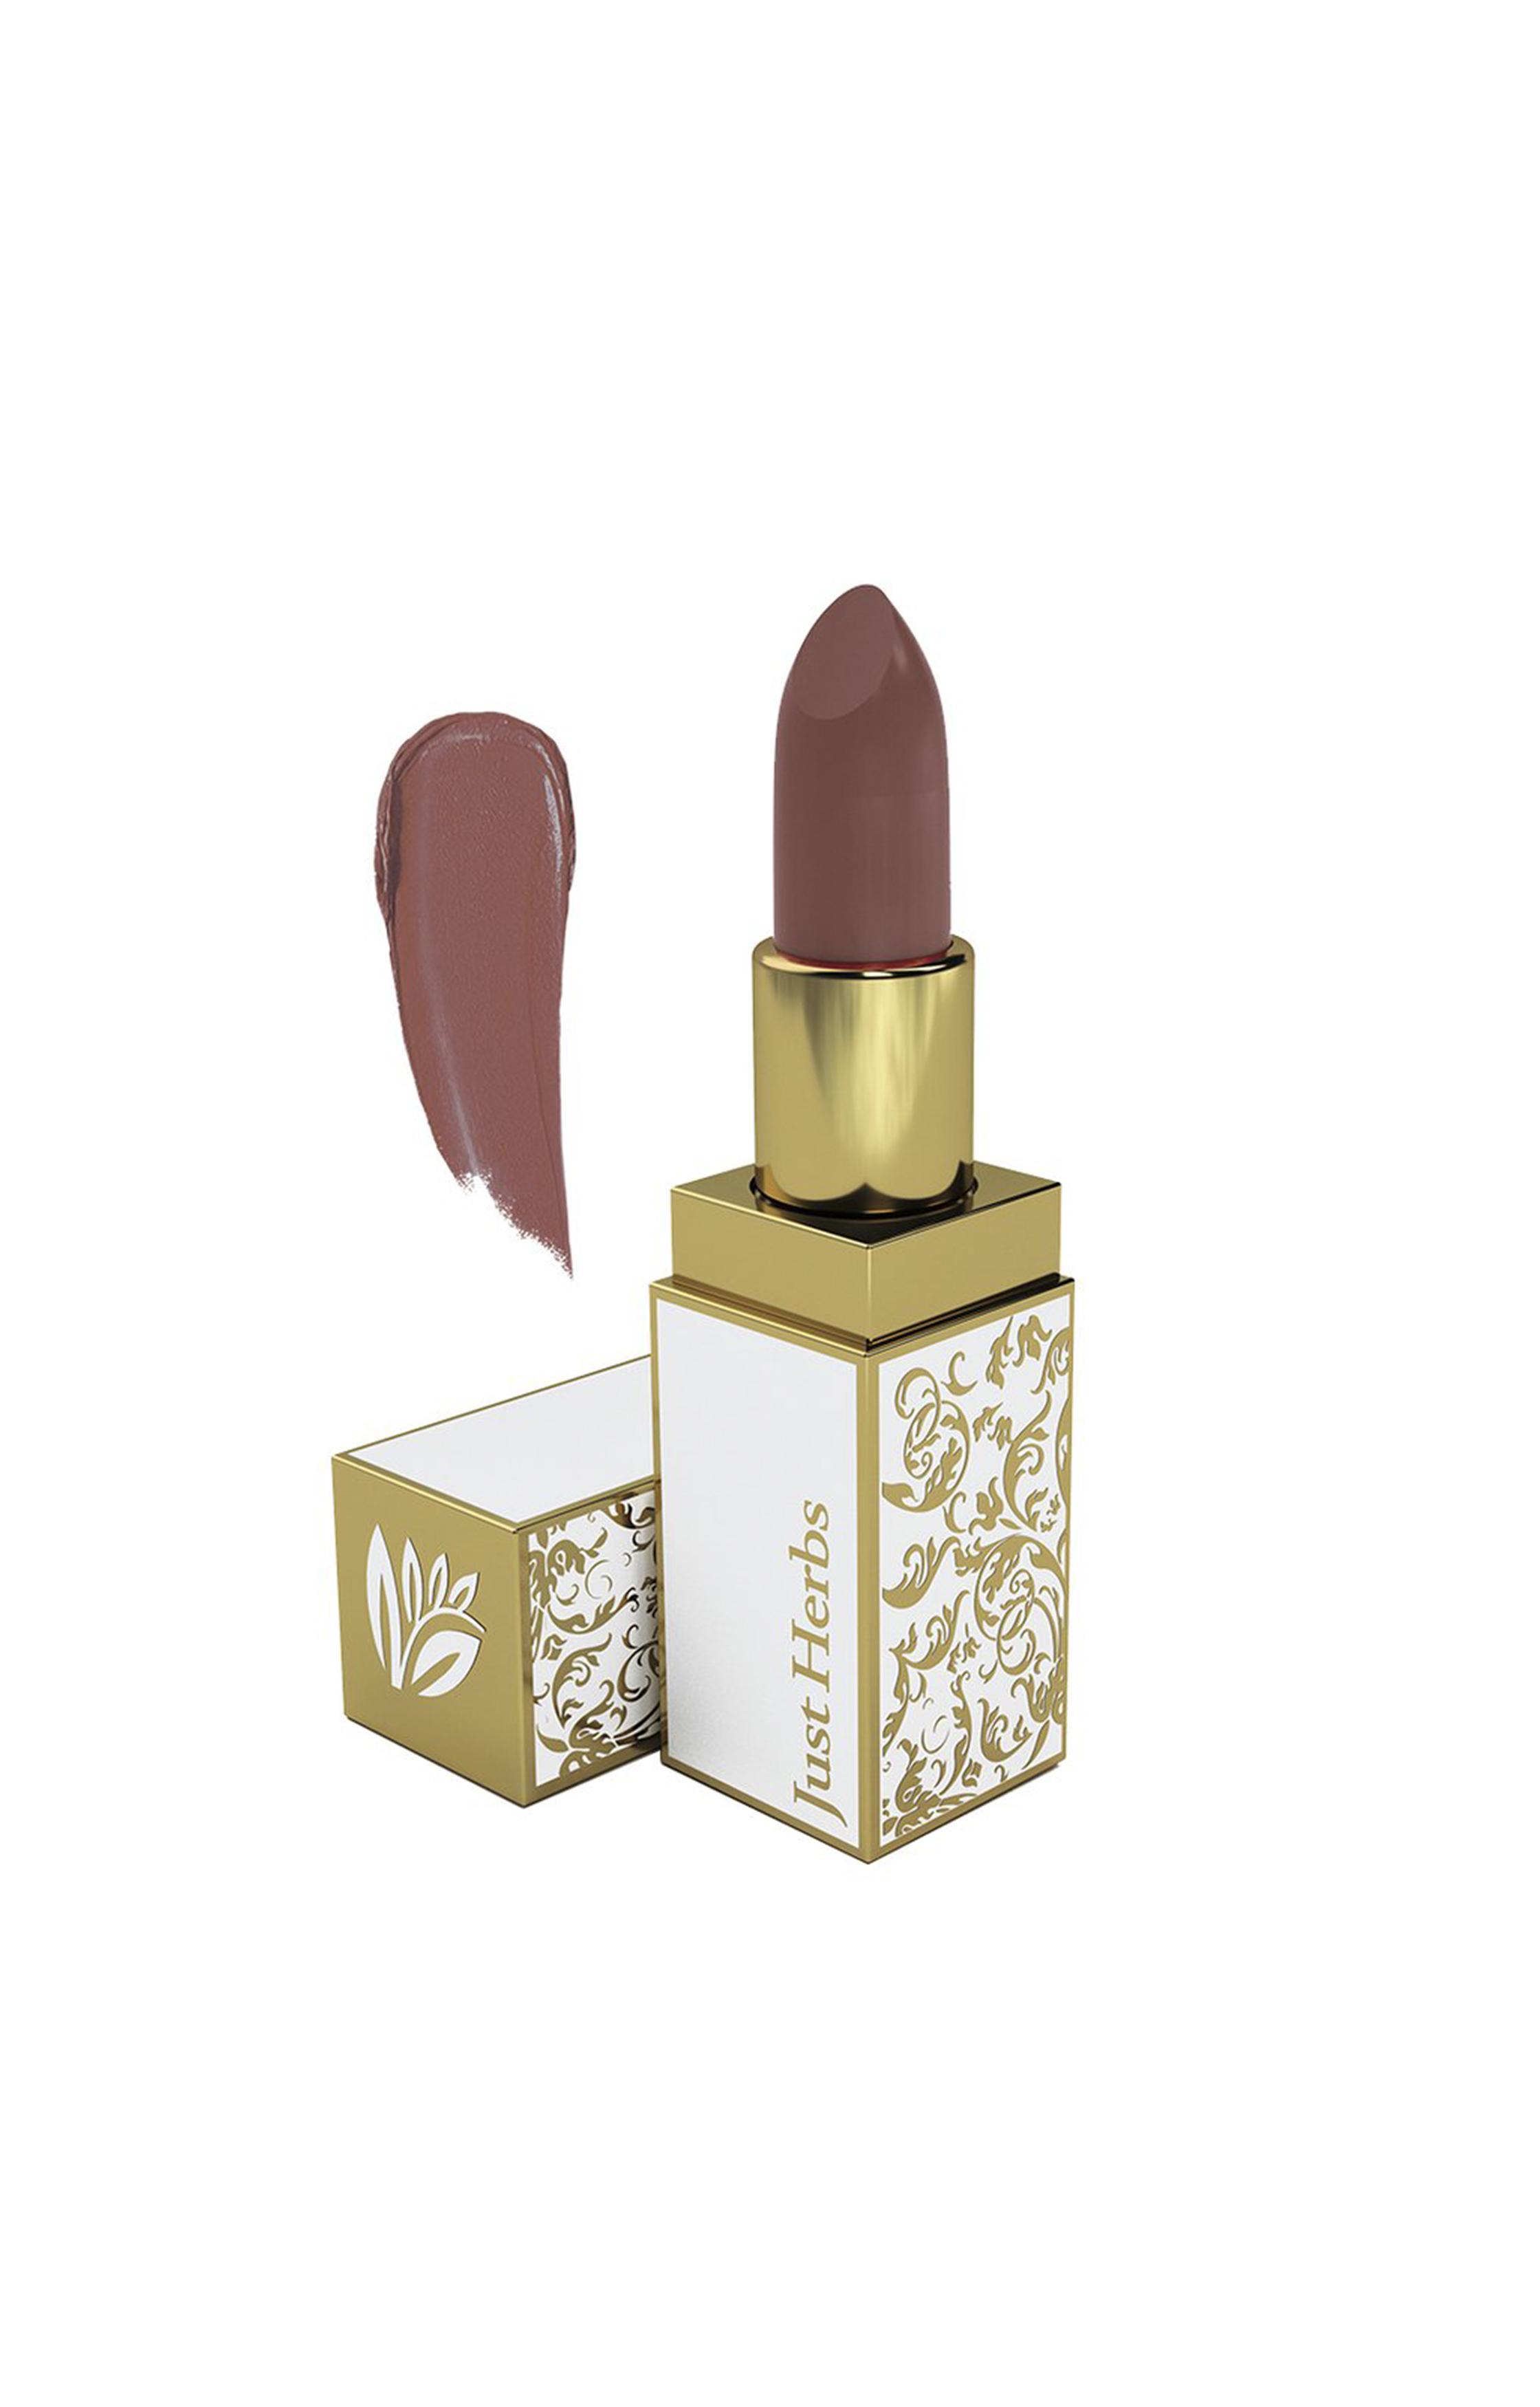 Just Herbs | Just Herbs Herb Enriched Ayurvedic Lipstick (Mauvish Brown, Shade no. 7)